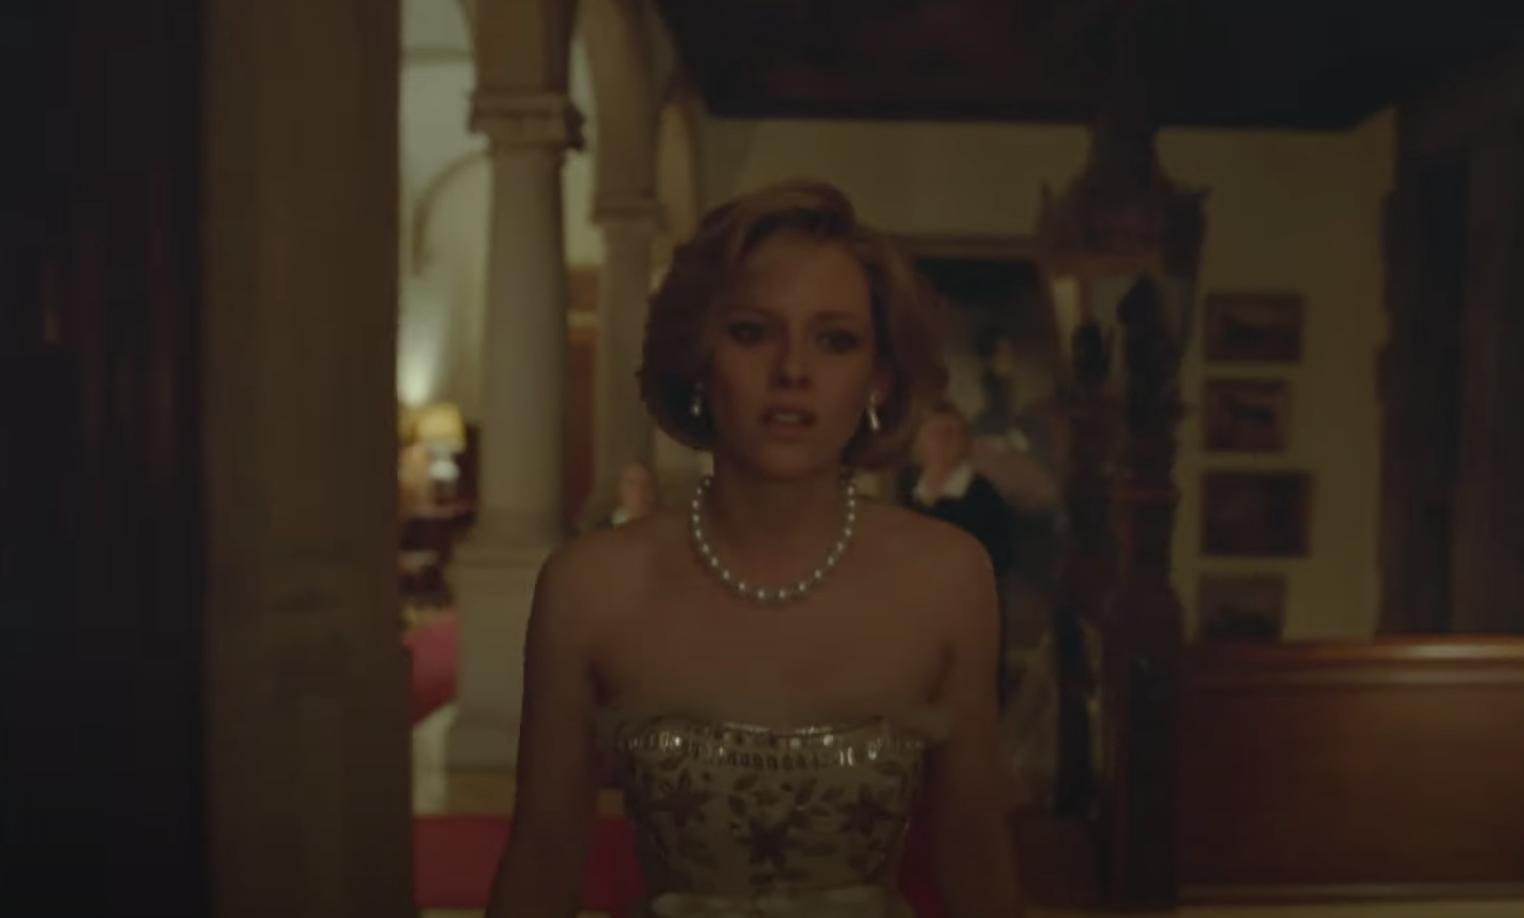 Kristen as Princess Diana, wearing pearls